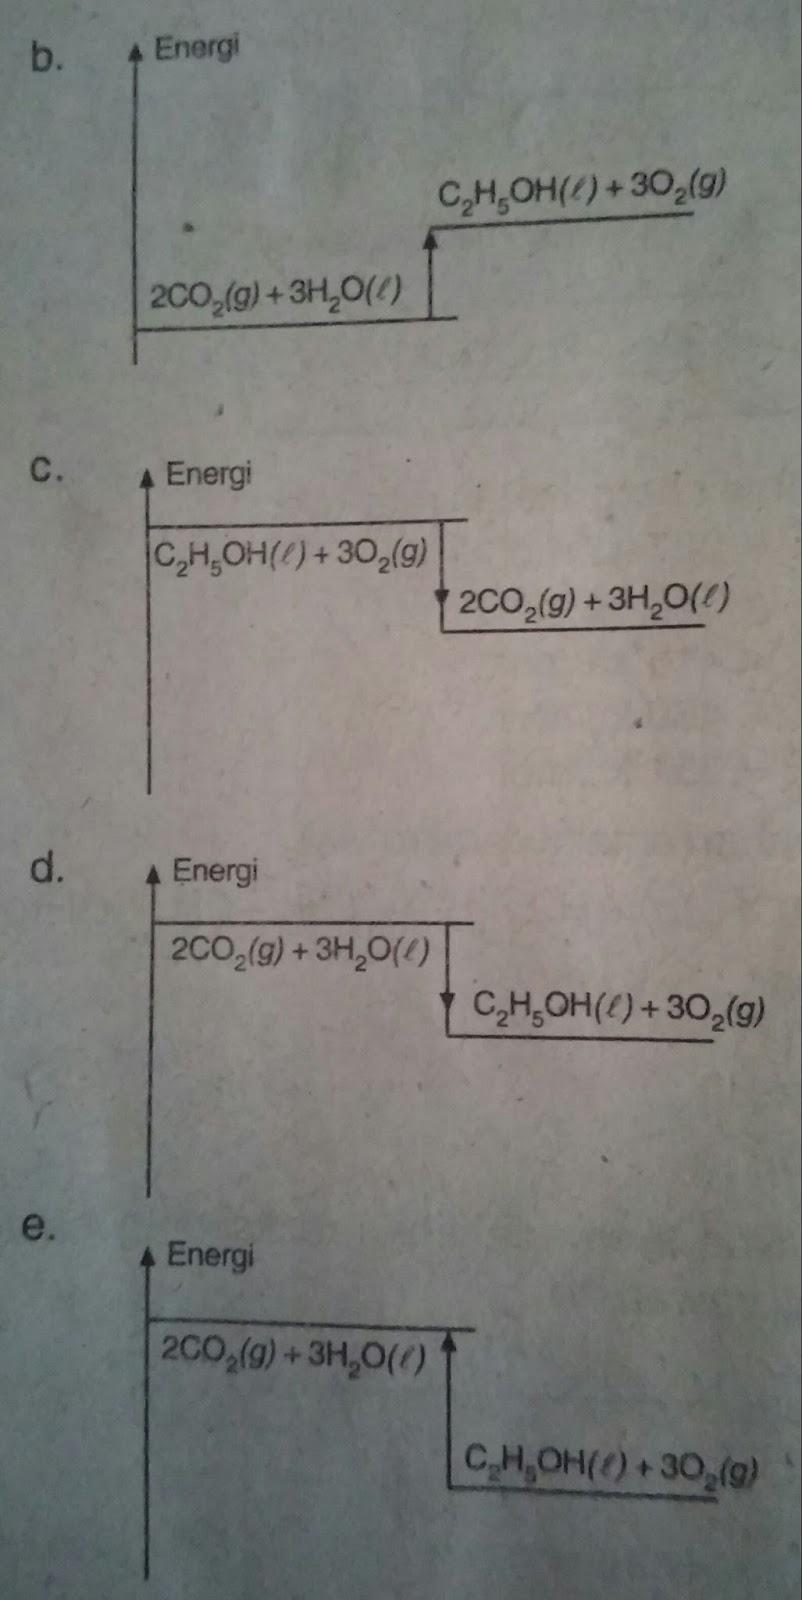 Soal kimia kelas 11 sma tentang menentukan harga perubahan entalpi kunci jawaban dan pembahasan ccuart Gallery